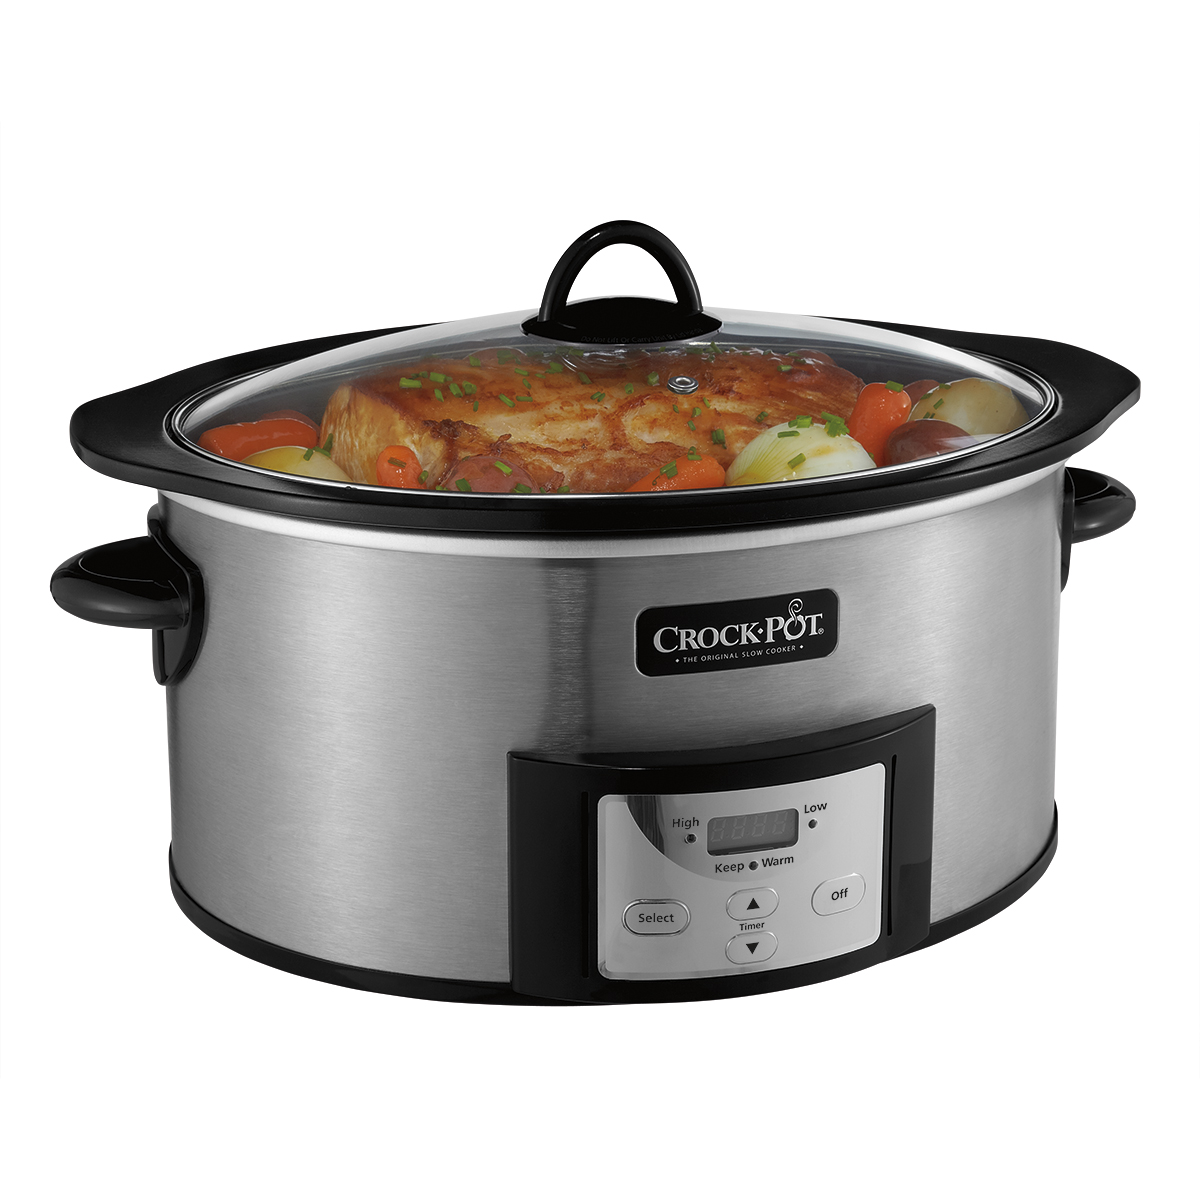 Crock-Pot 6 Quart Programmable Slow Cooker with Stovetop-Safe Cooking Pot, 1 Each